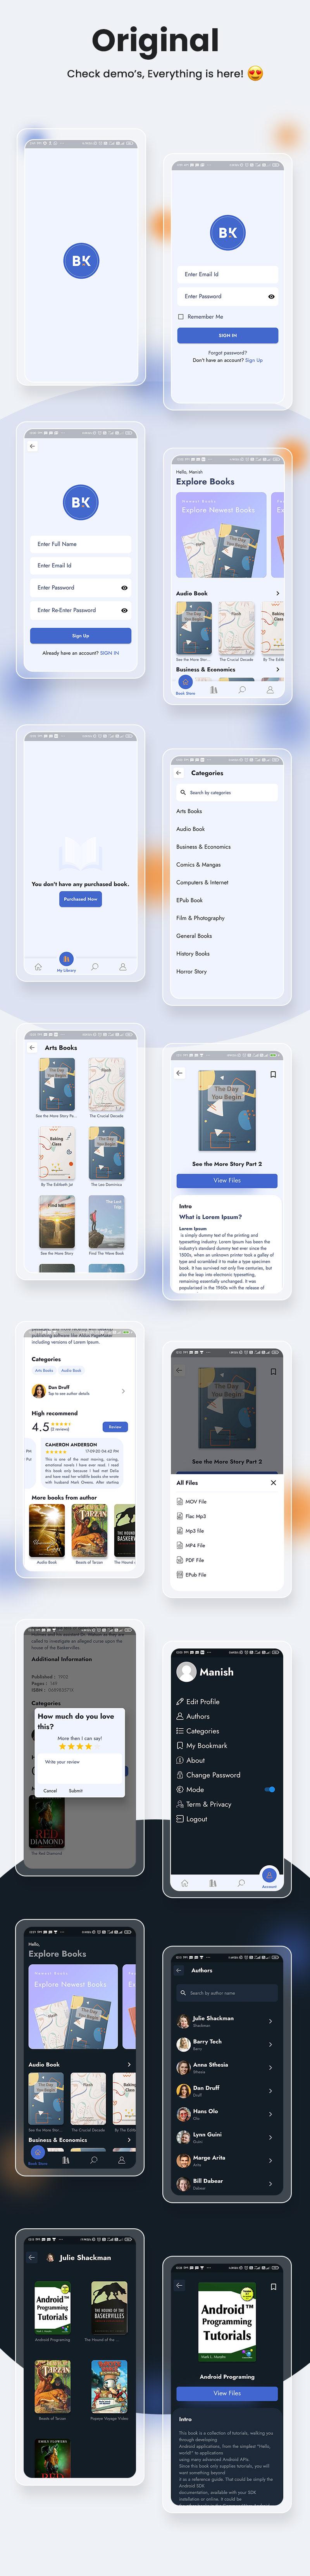 Best online bootstore flutter app | Bookkart | Iqonic Design flutter ebook reader app for wordpress with woocommerce Bookkart 4